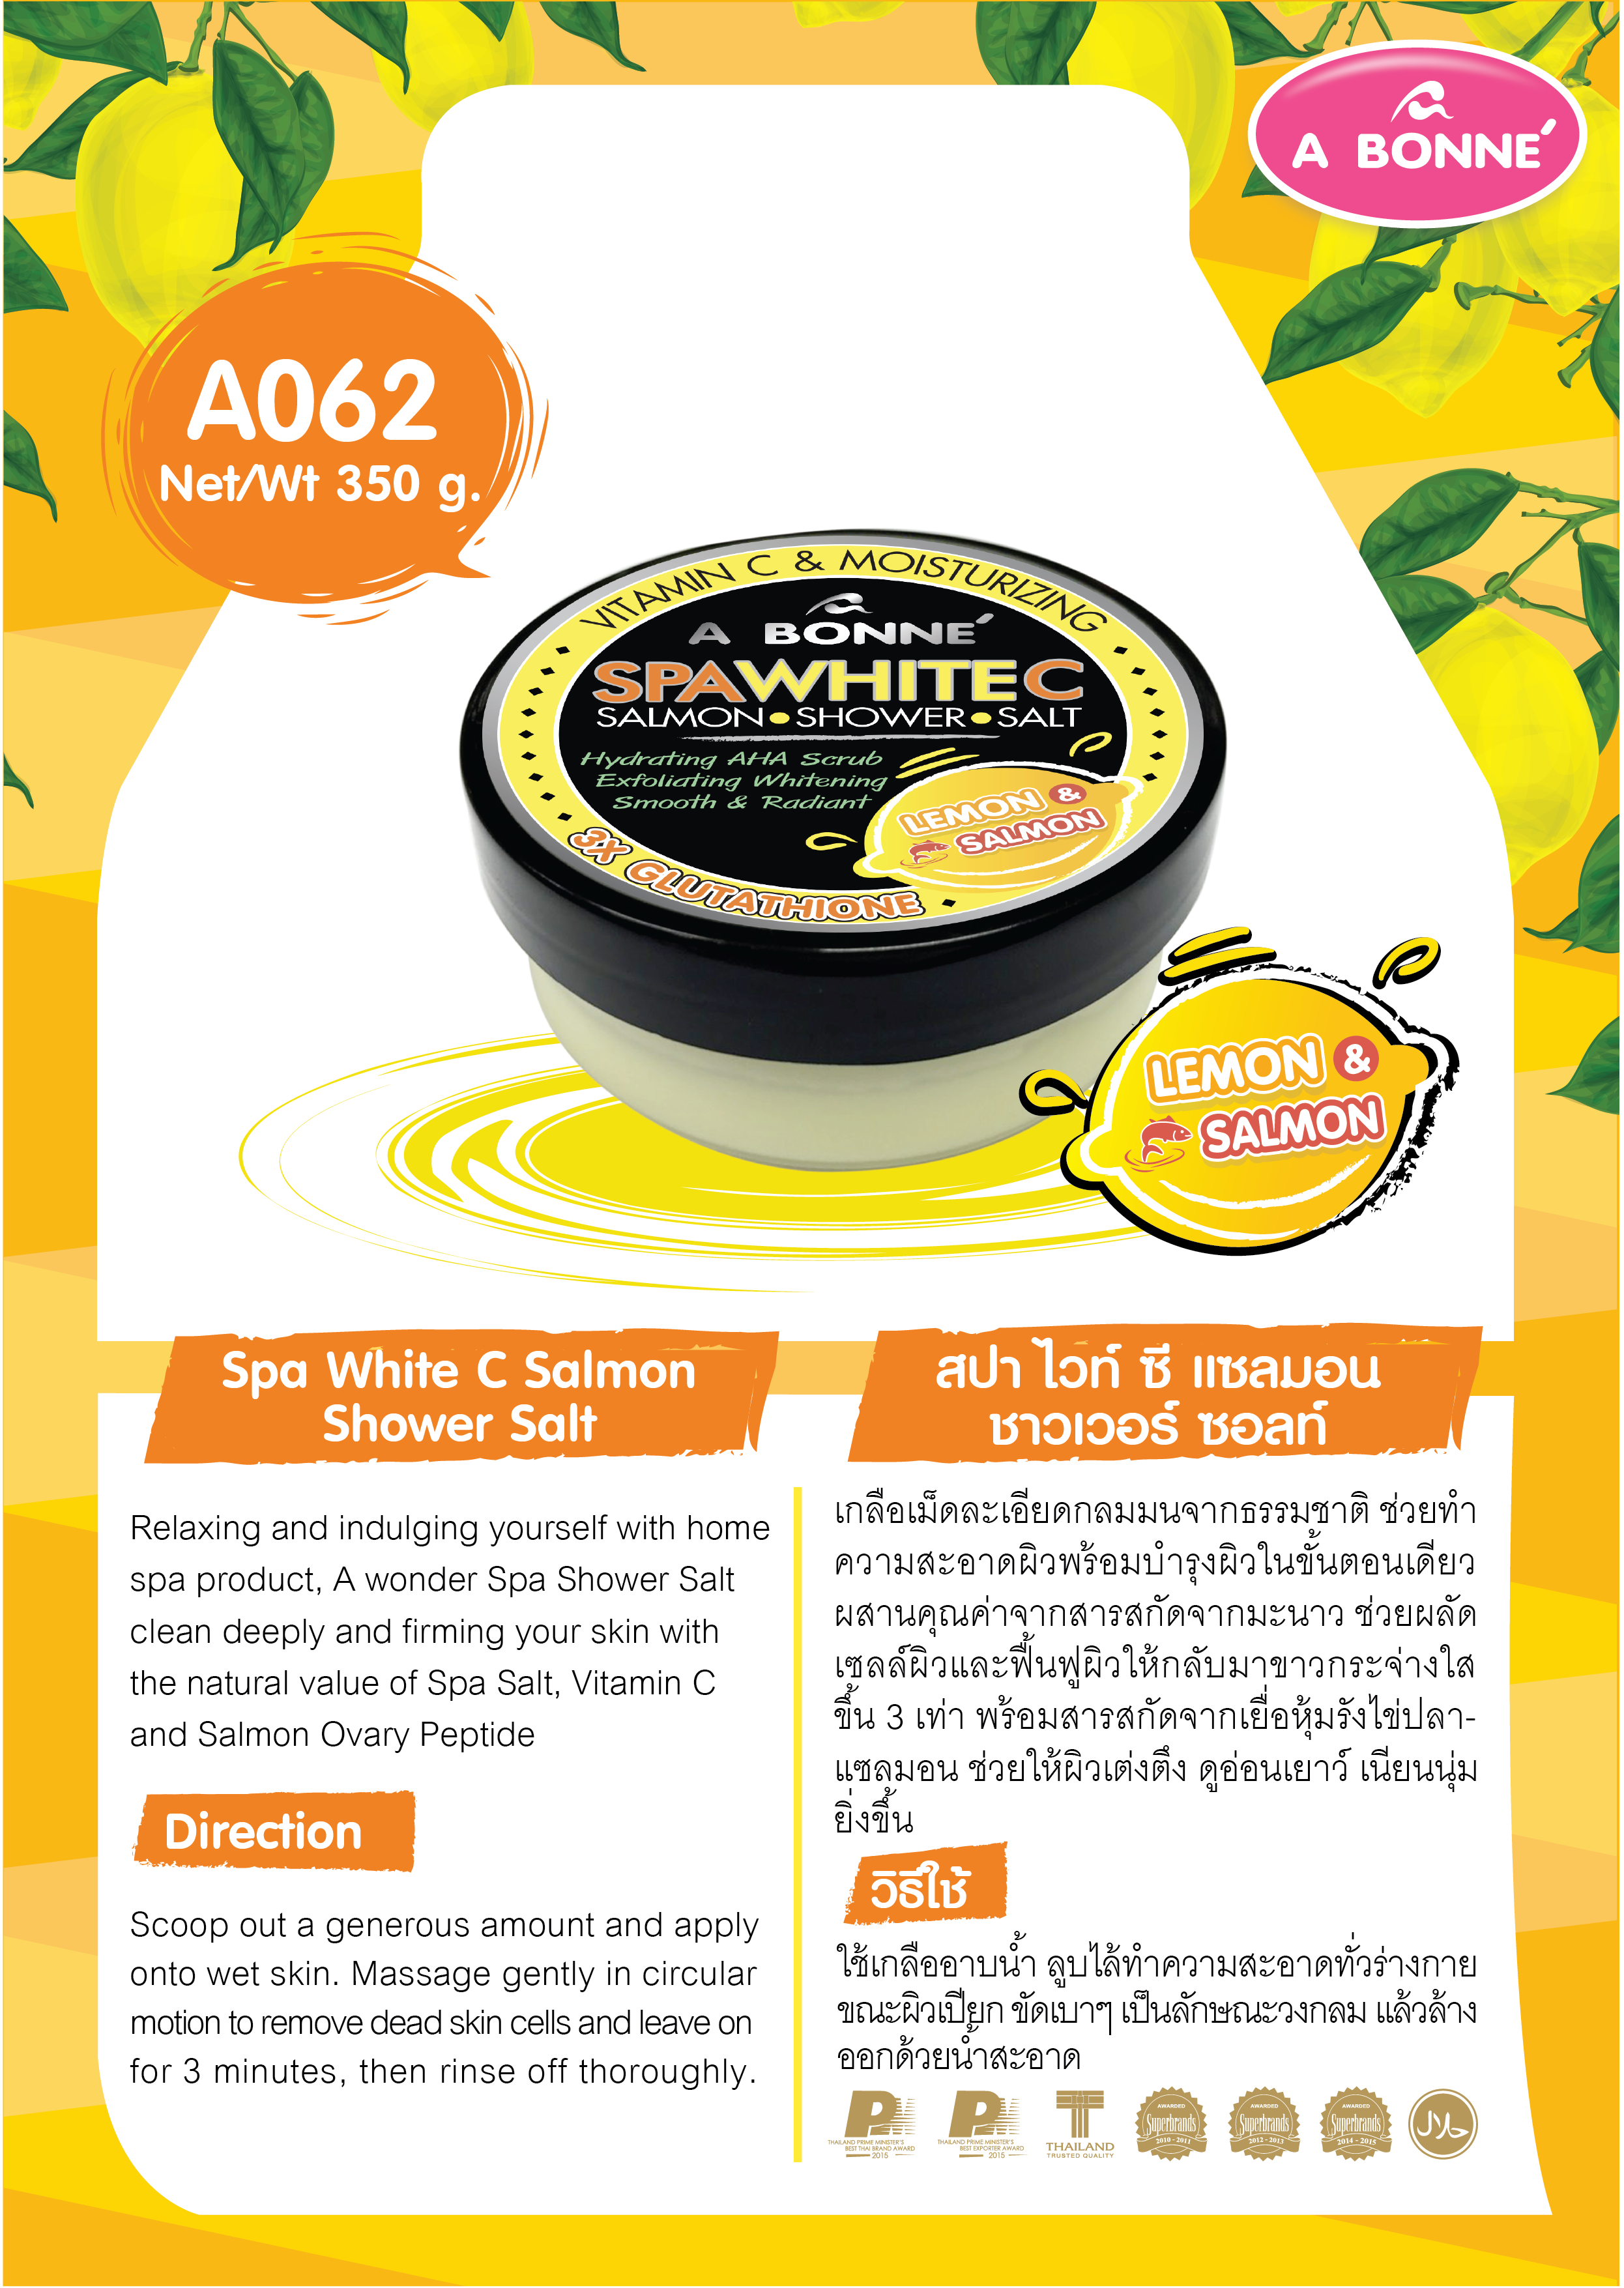 Spa White C Salmon Shower Salt